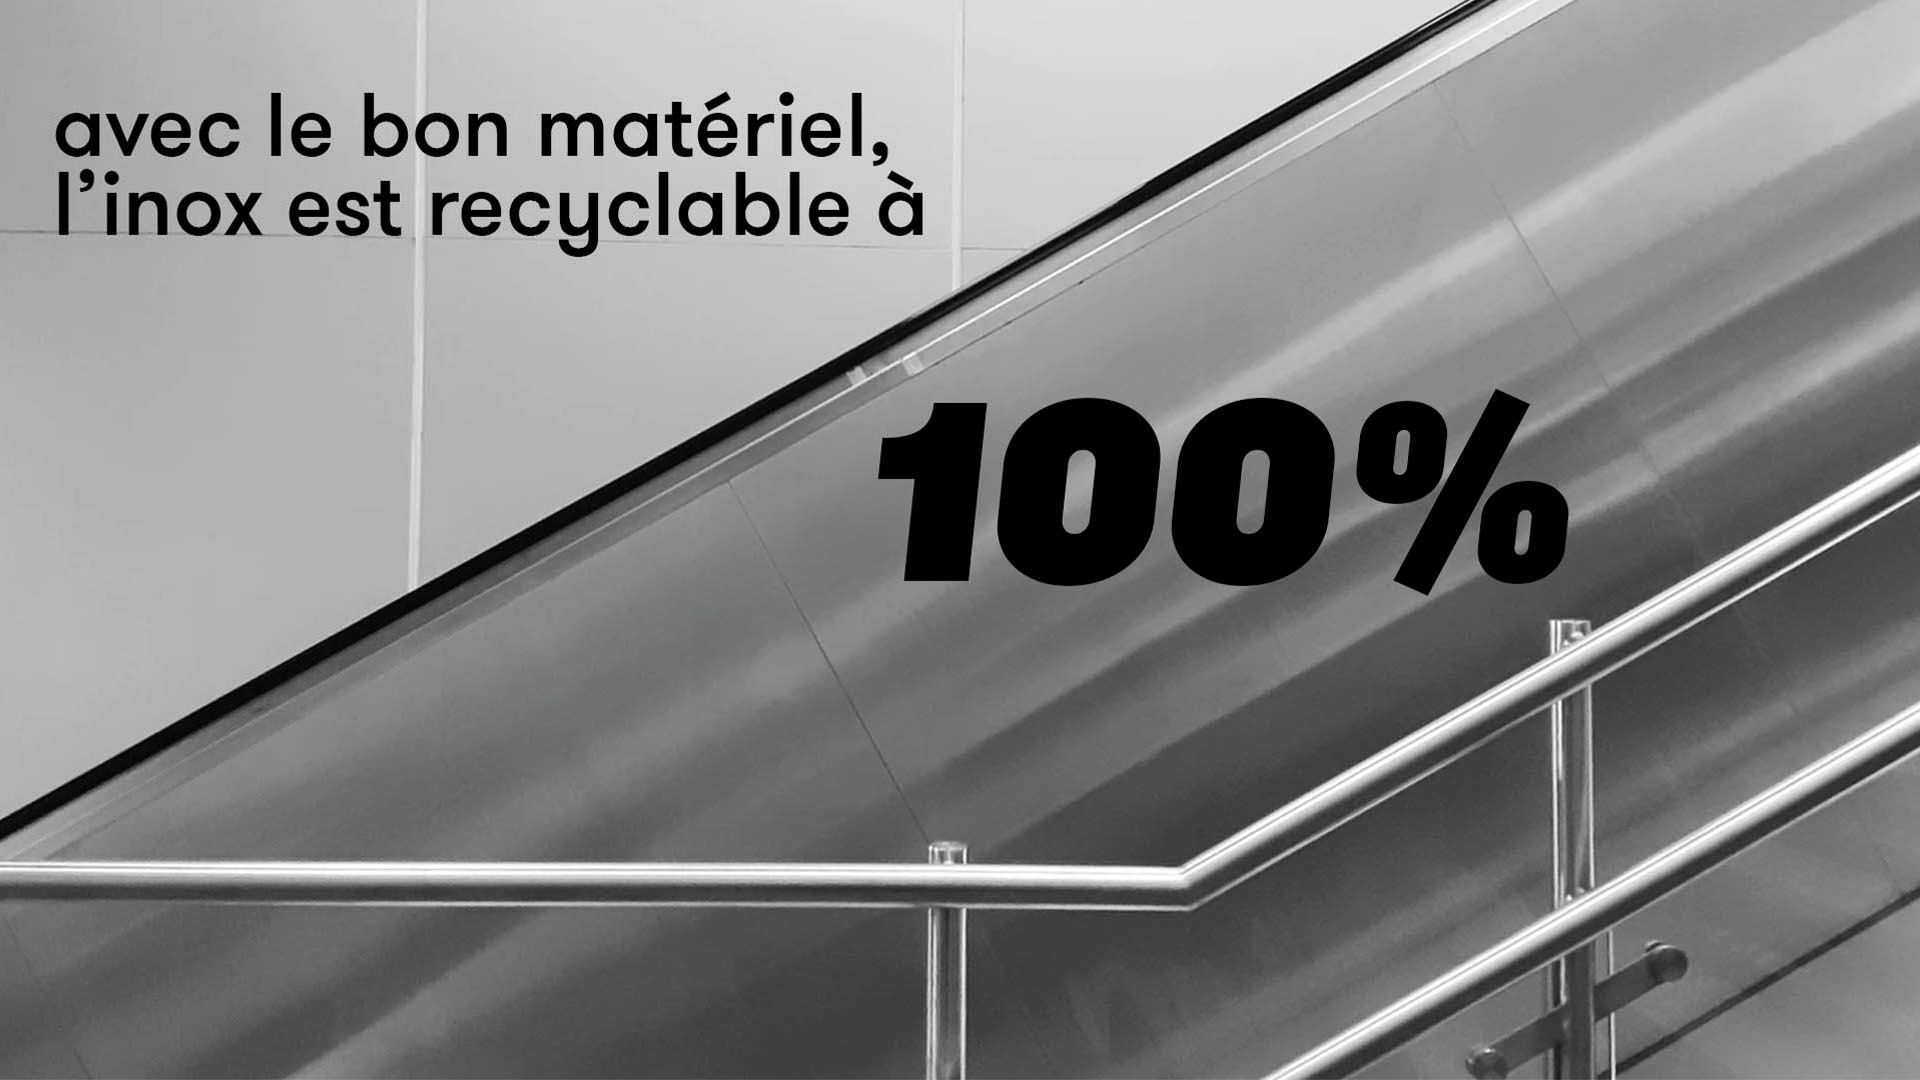 Inox durable zéro déchet acier inoxydable recyclable